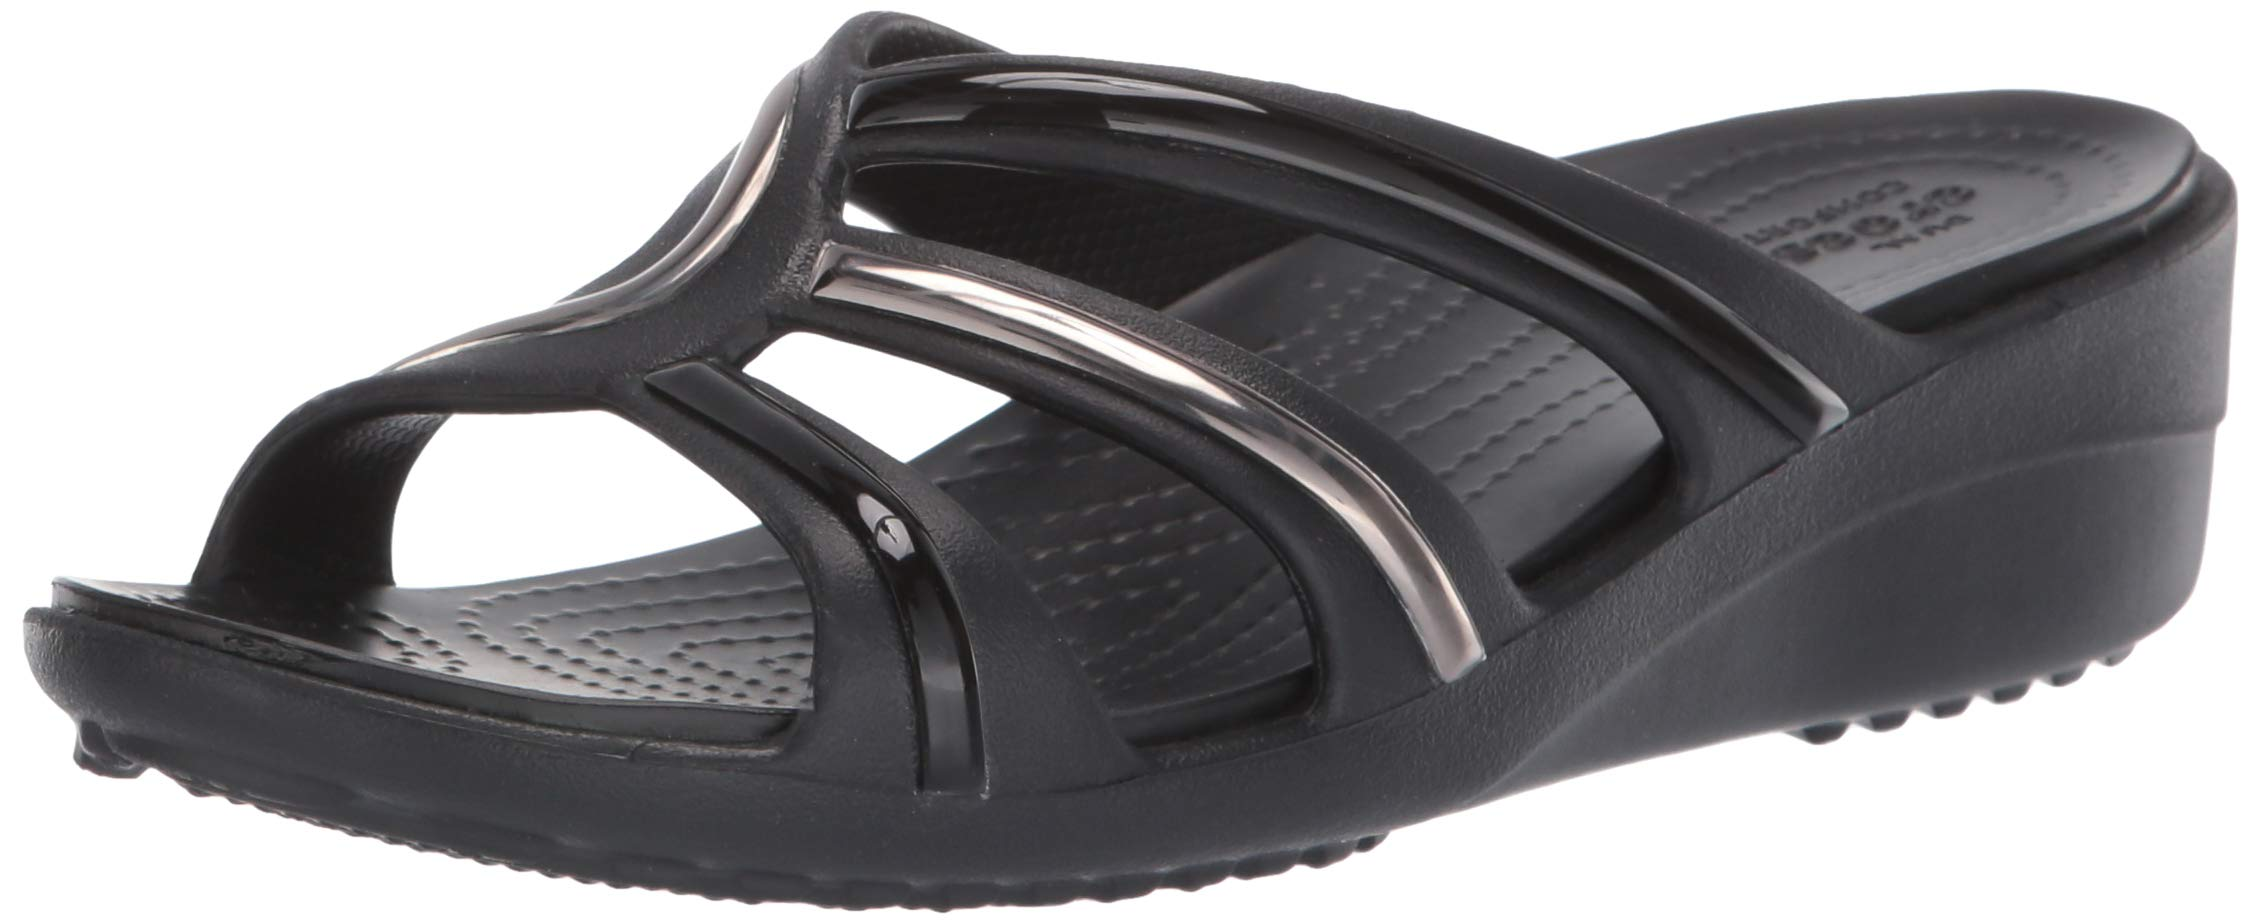 Crocs Women's Sanrah MetalBlock Strap Wedge Sandal, Multi Black, 8 M US by Crocs